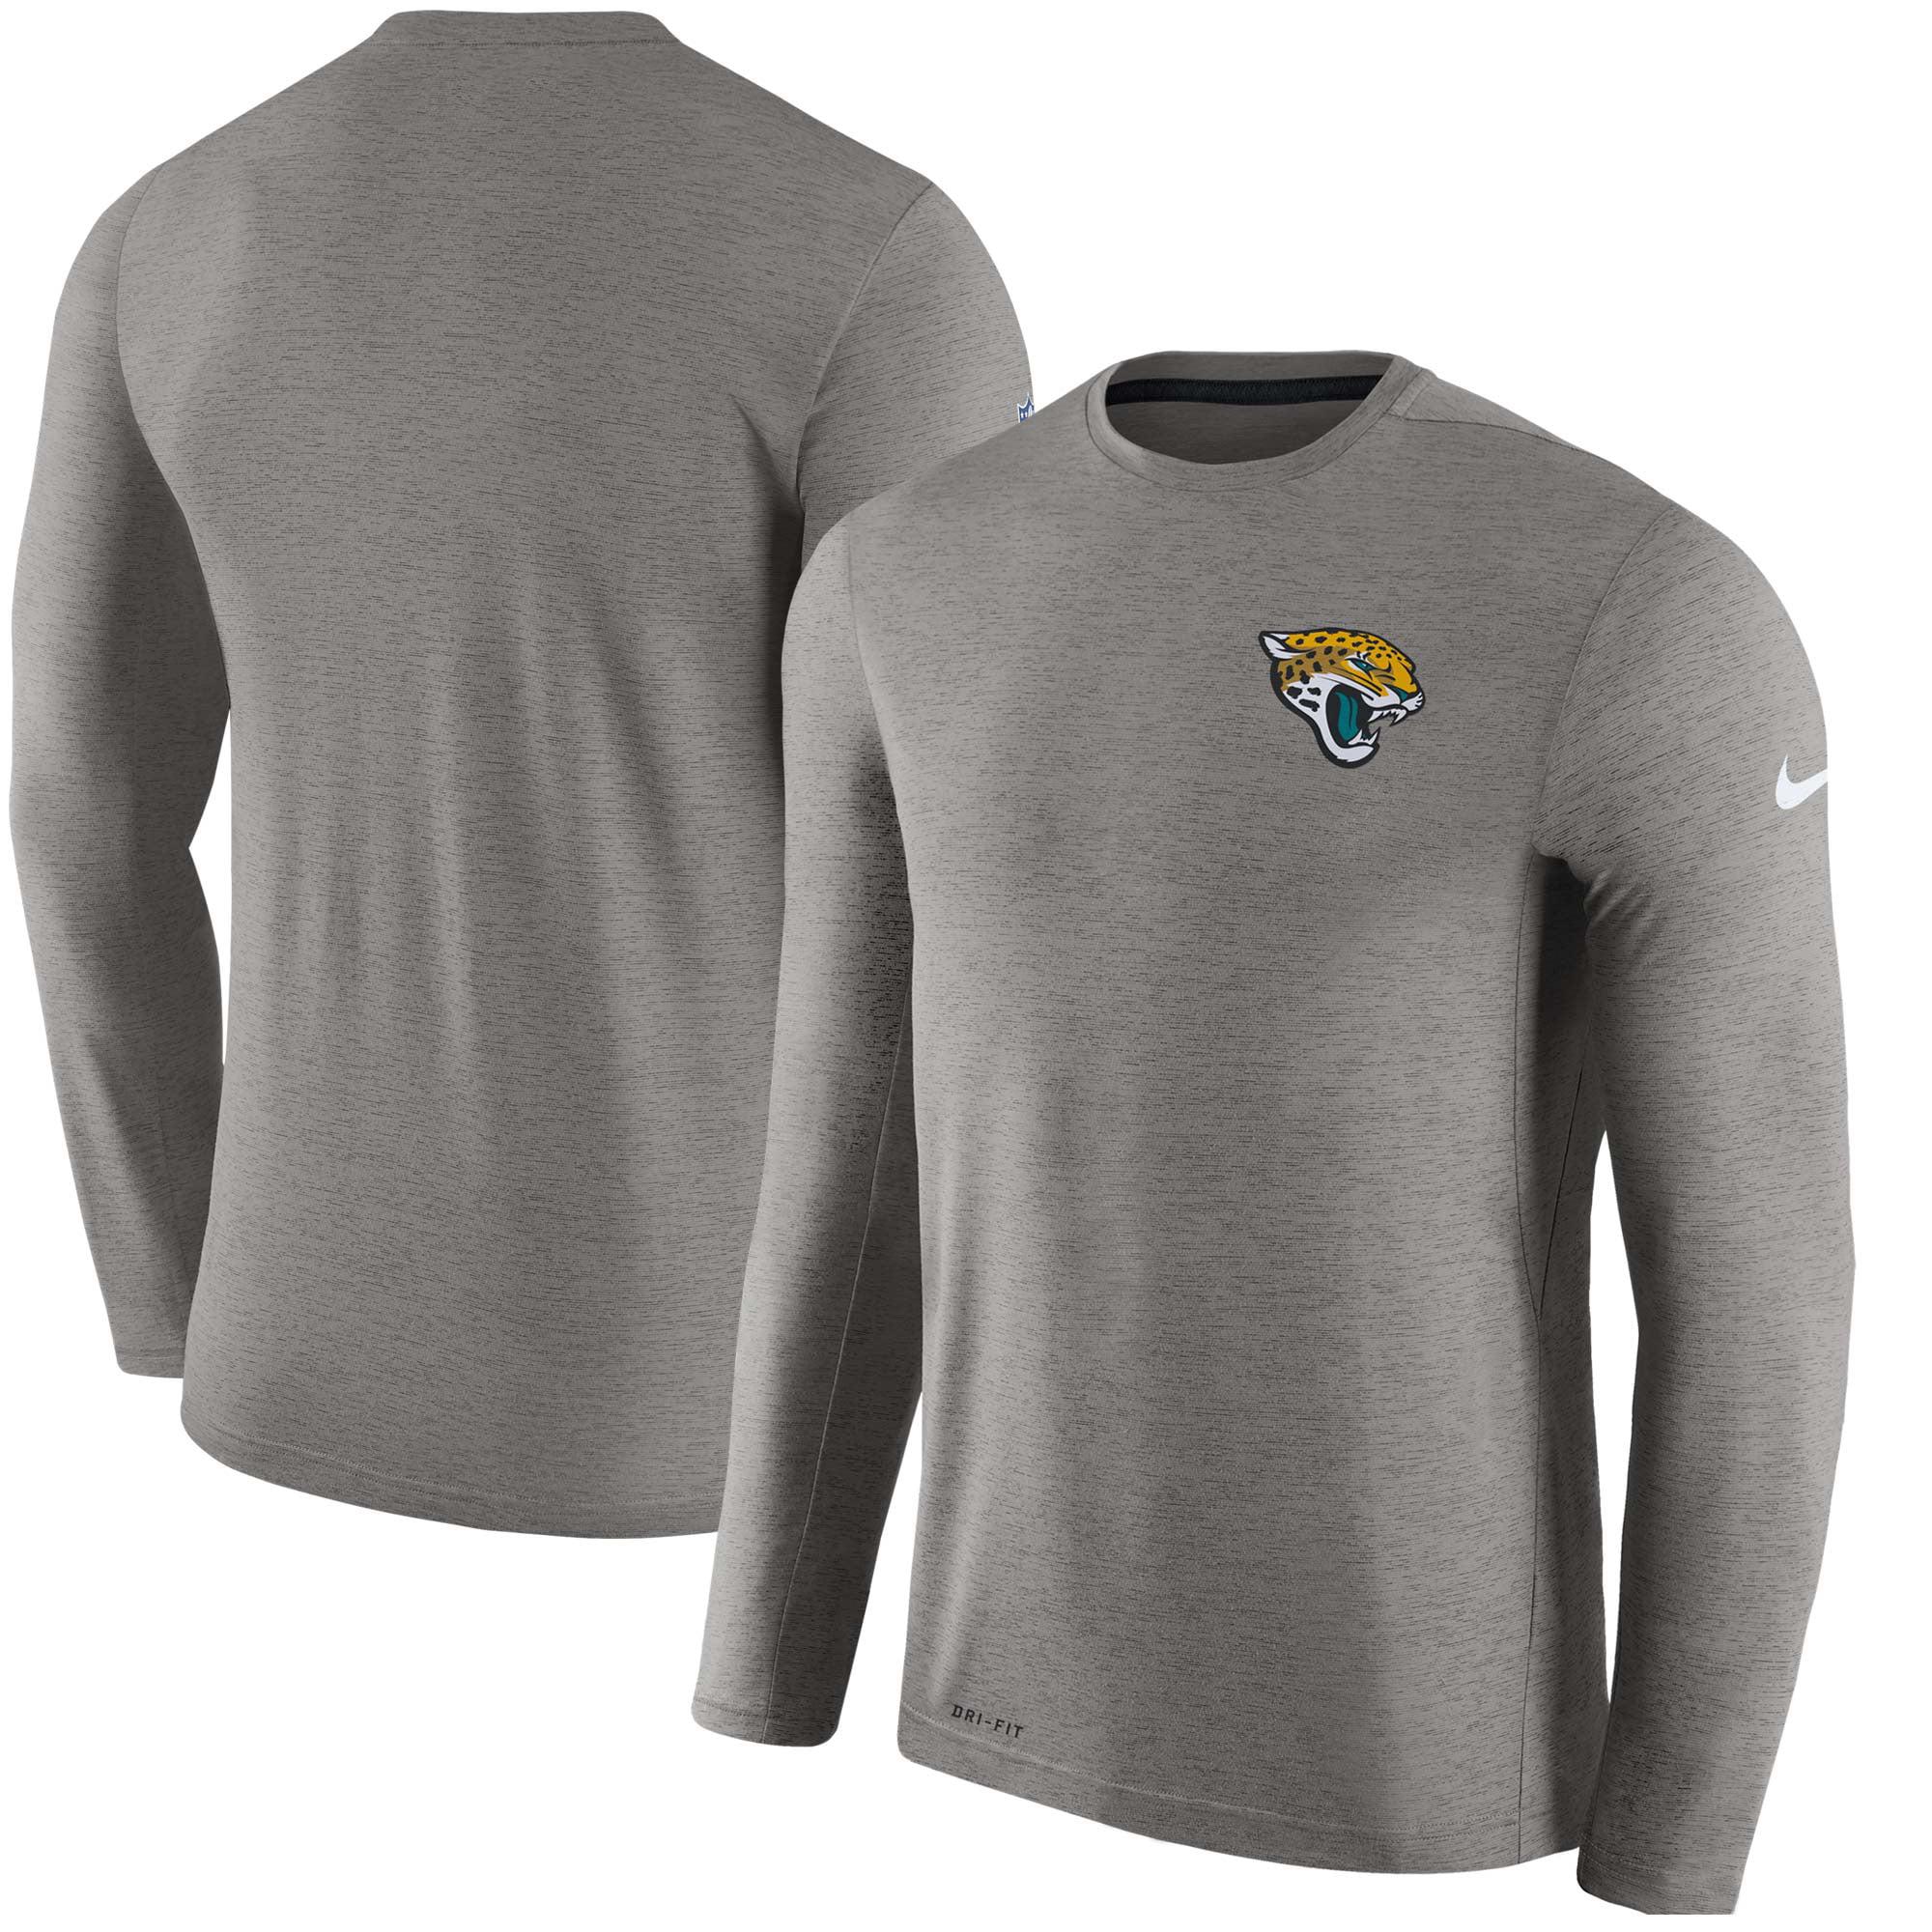 Jacksonville Jaguars Nike Sideline Coaches Long Sleeve Performance T-Shirt - Gray